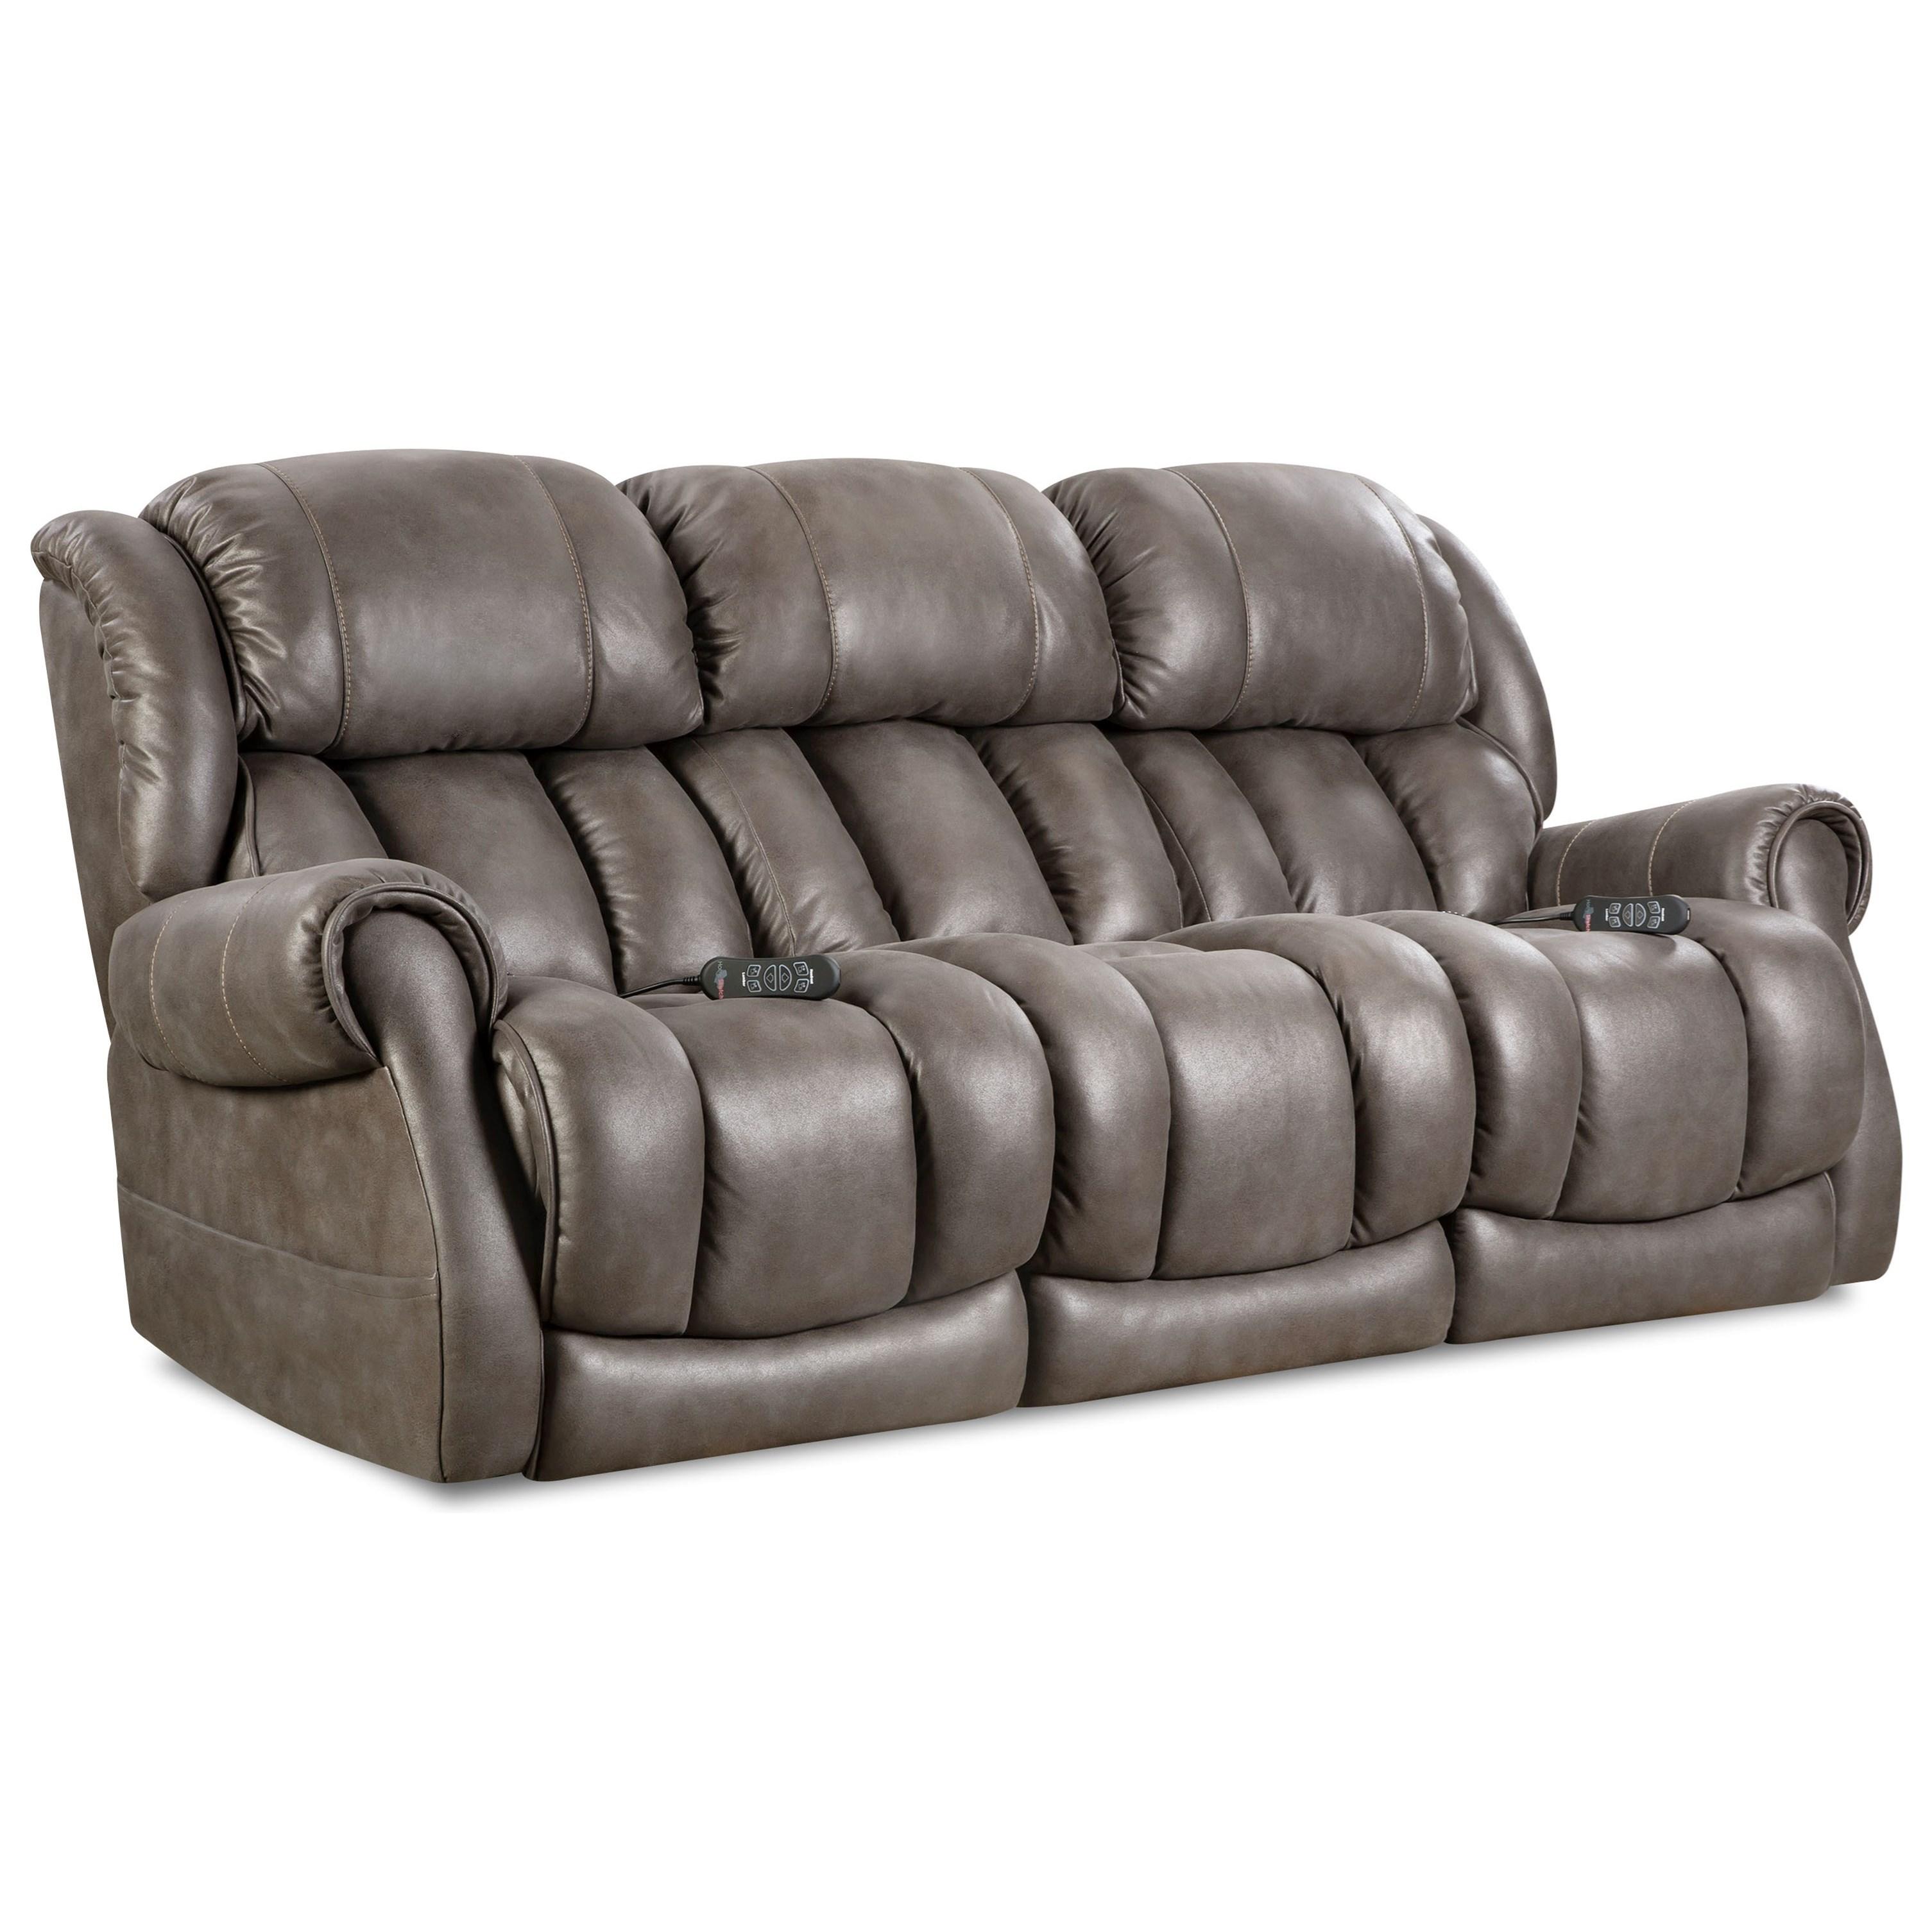 Atlantis Power Reclining Sofa by HomeStretch at Standard Furniture